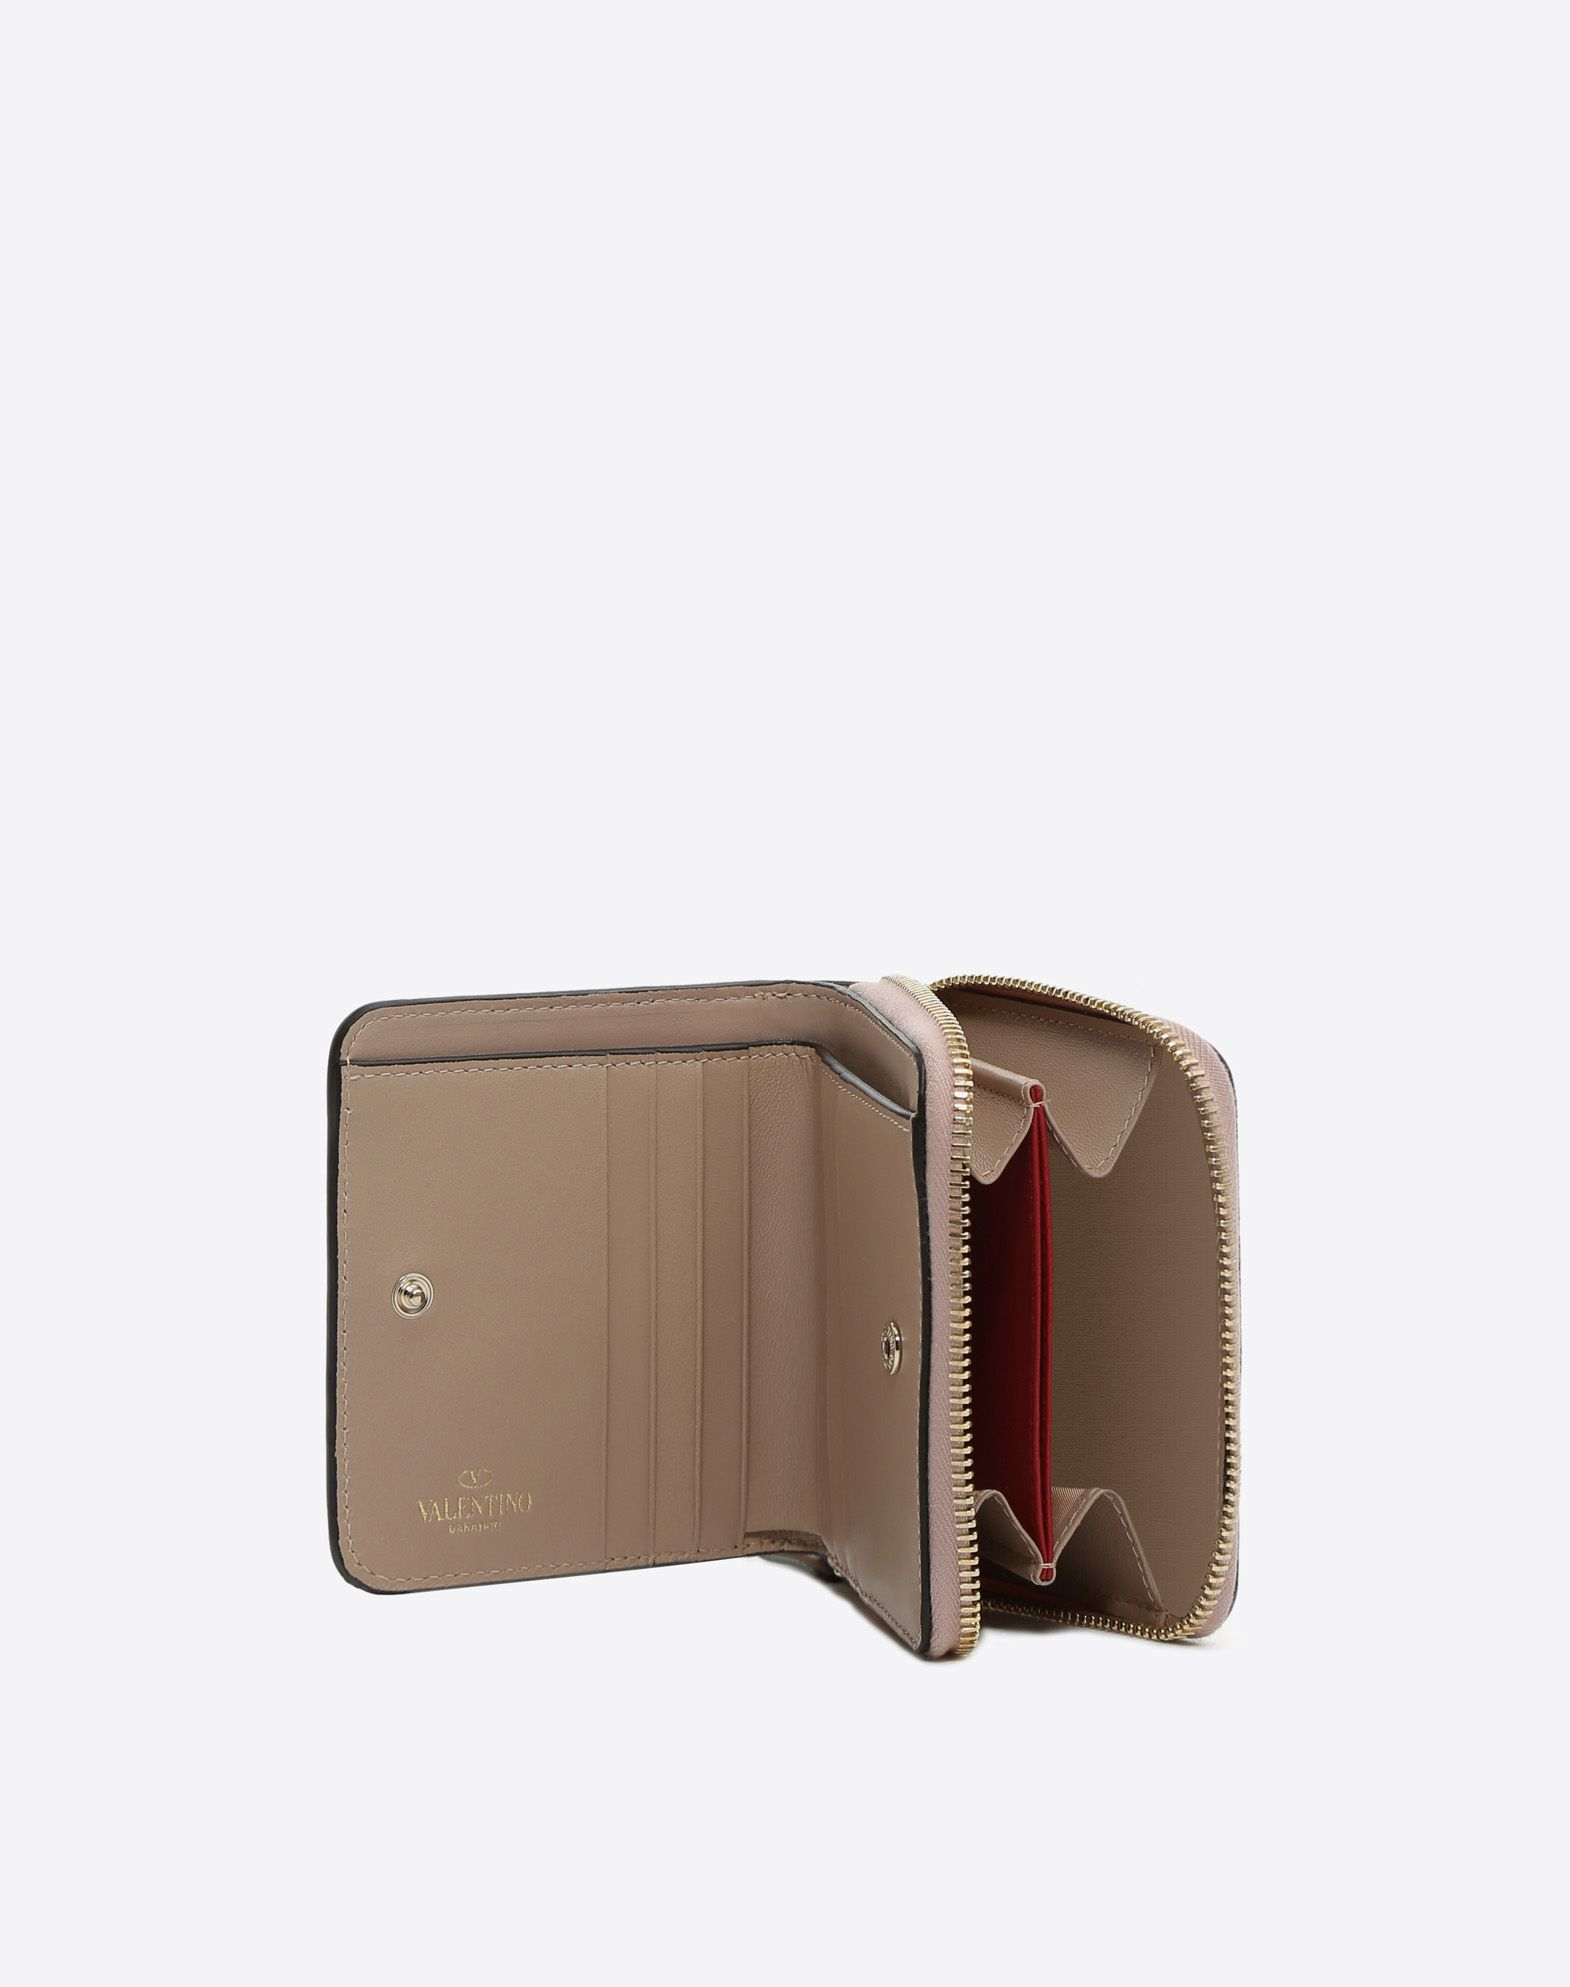 VALENTINO Studs Solid colour Zip closure Internal card slots  46513701ka